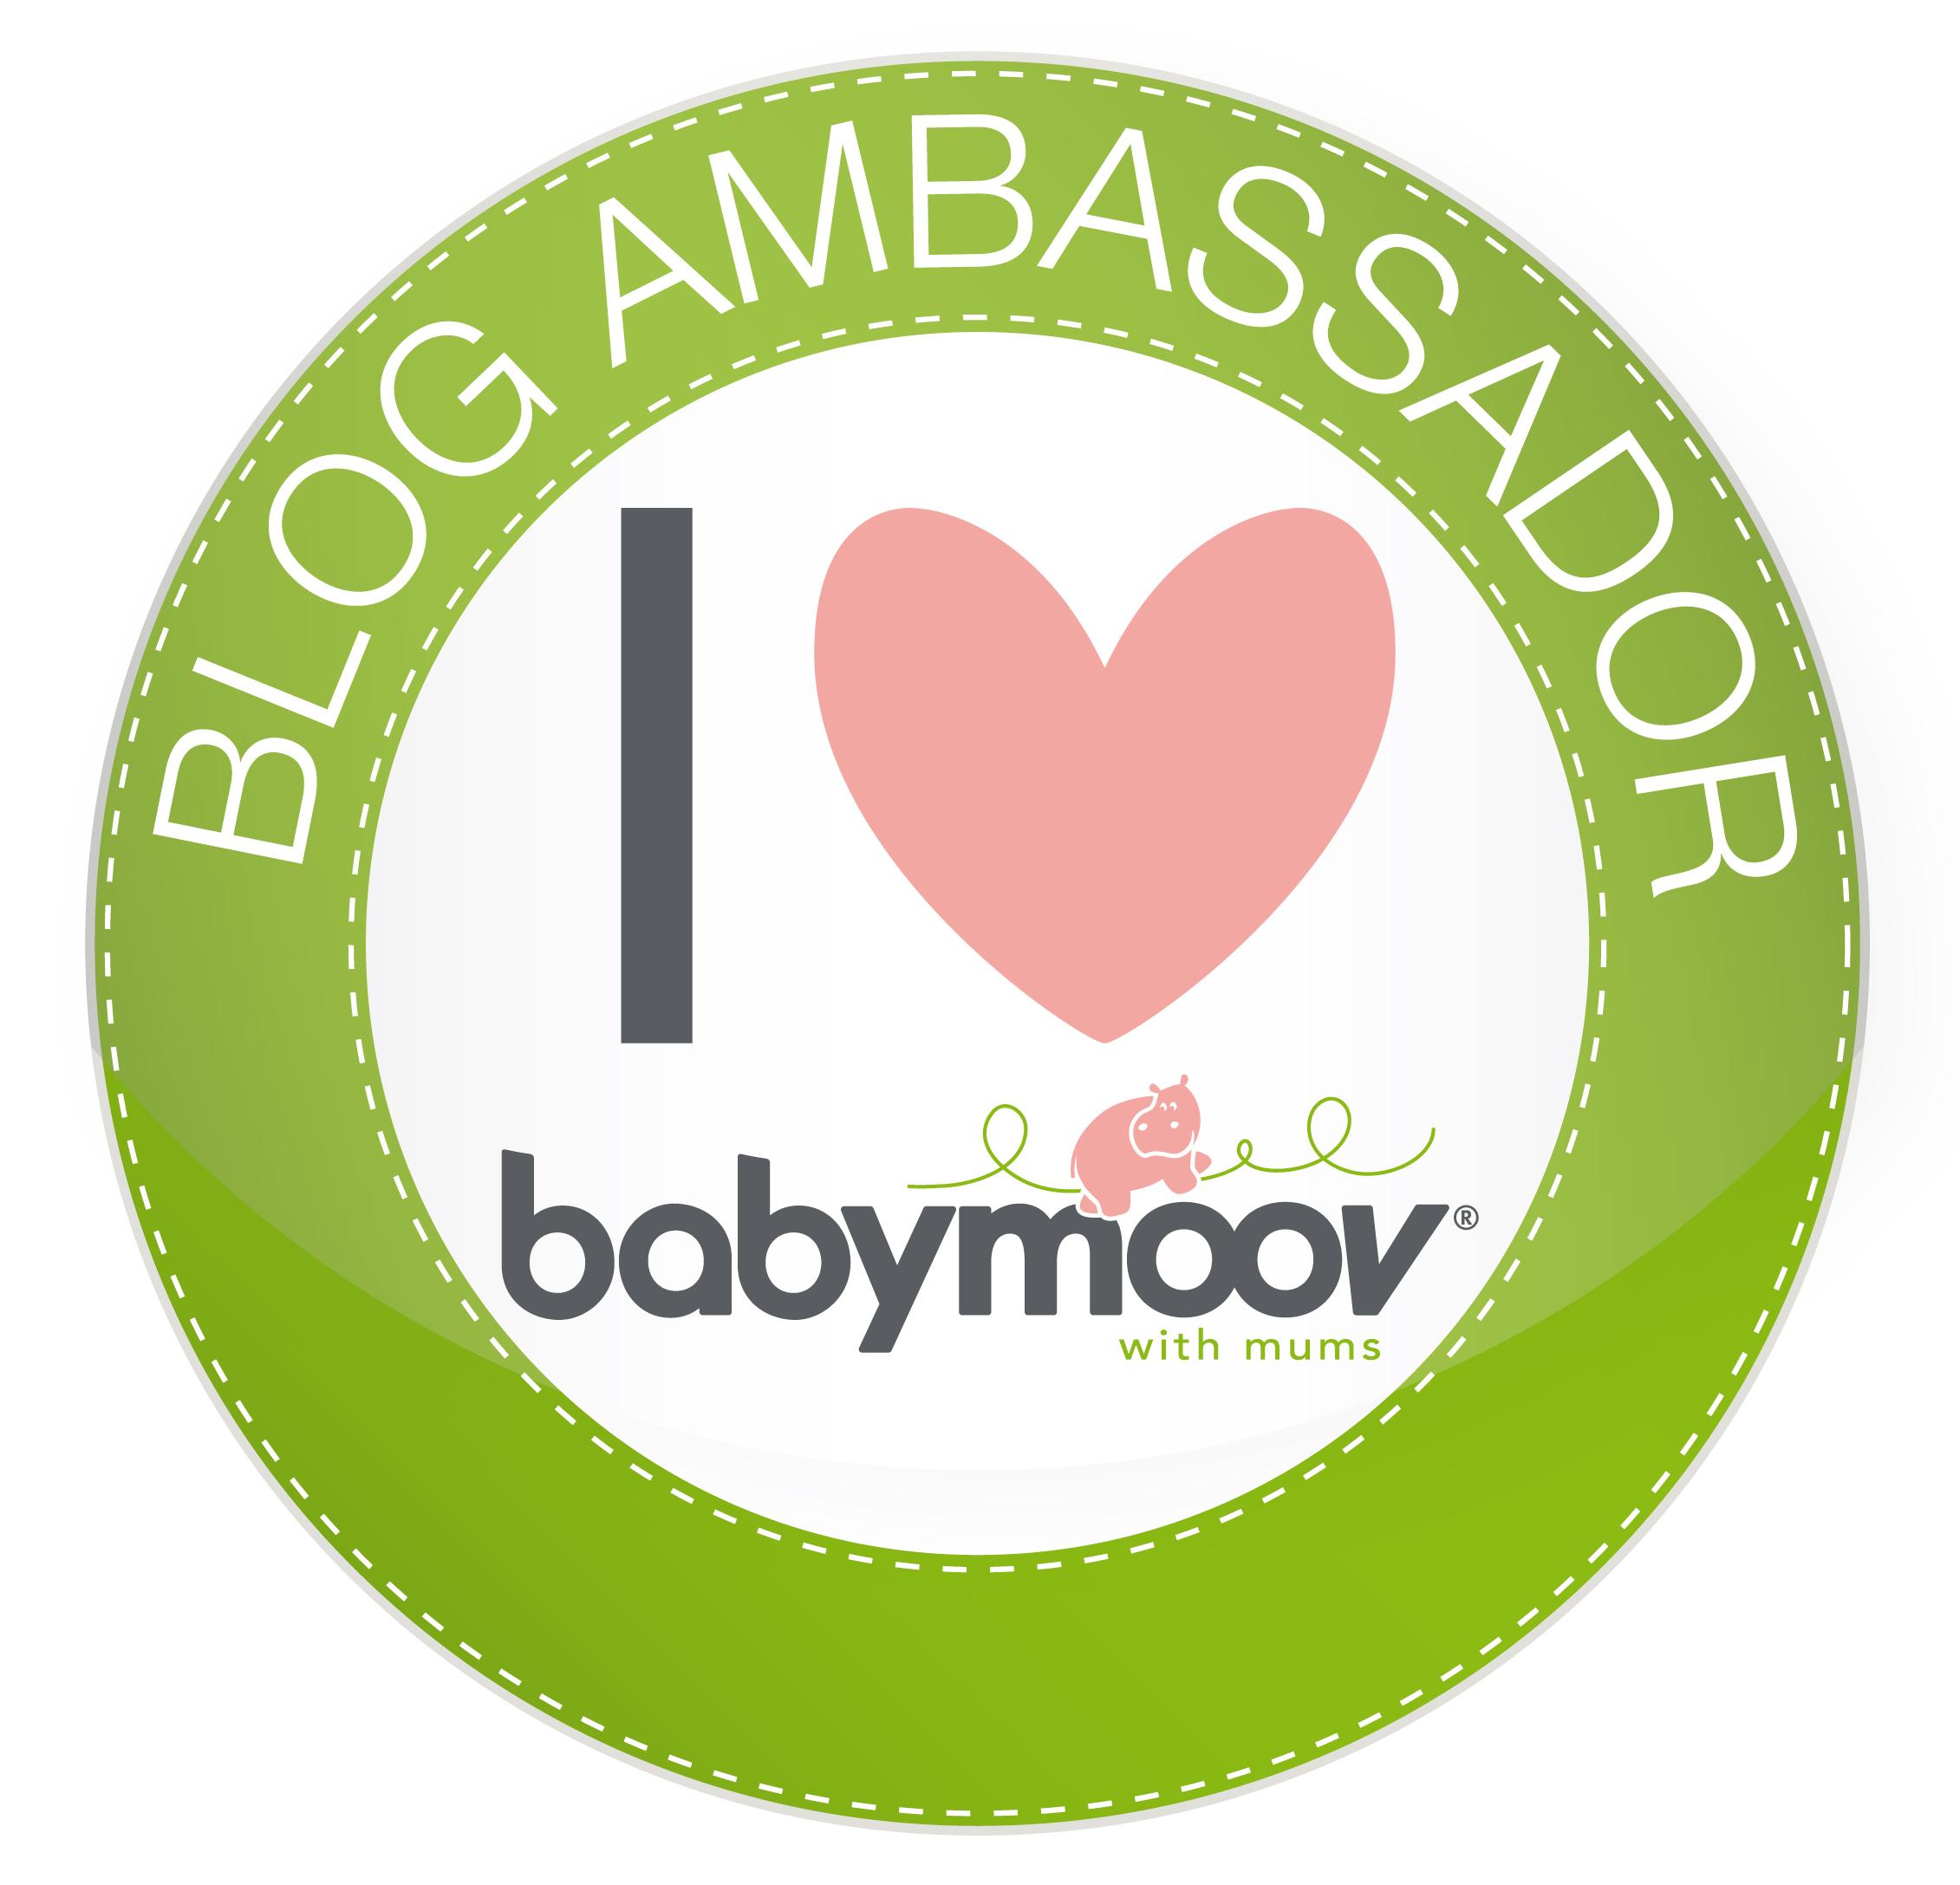 I'm a Babymoov ambassador